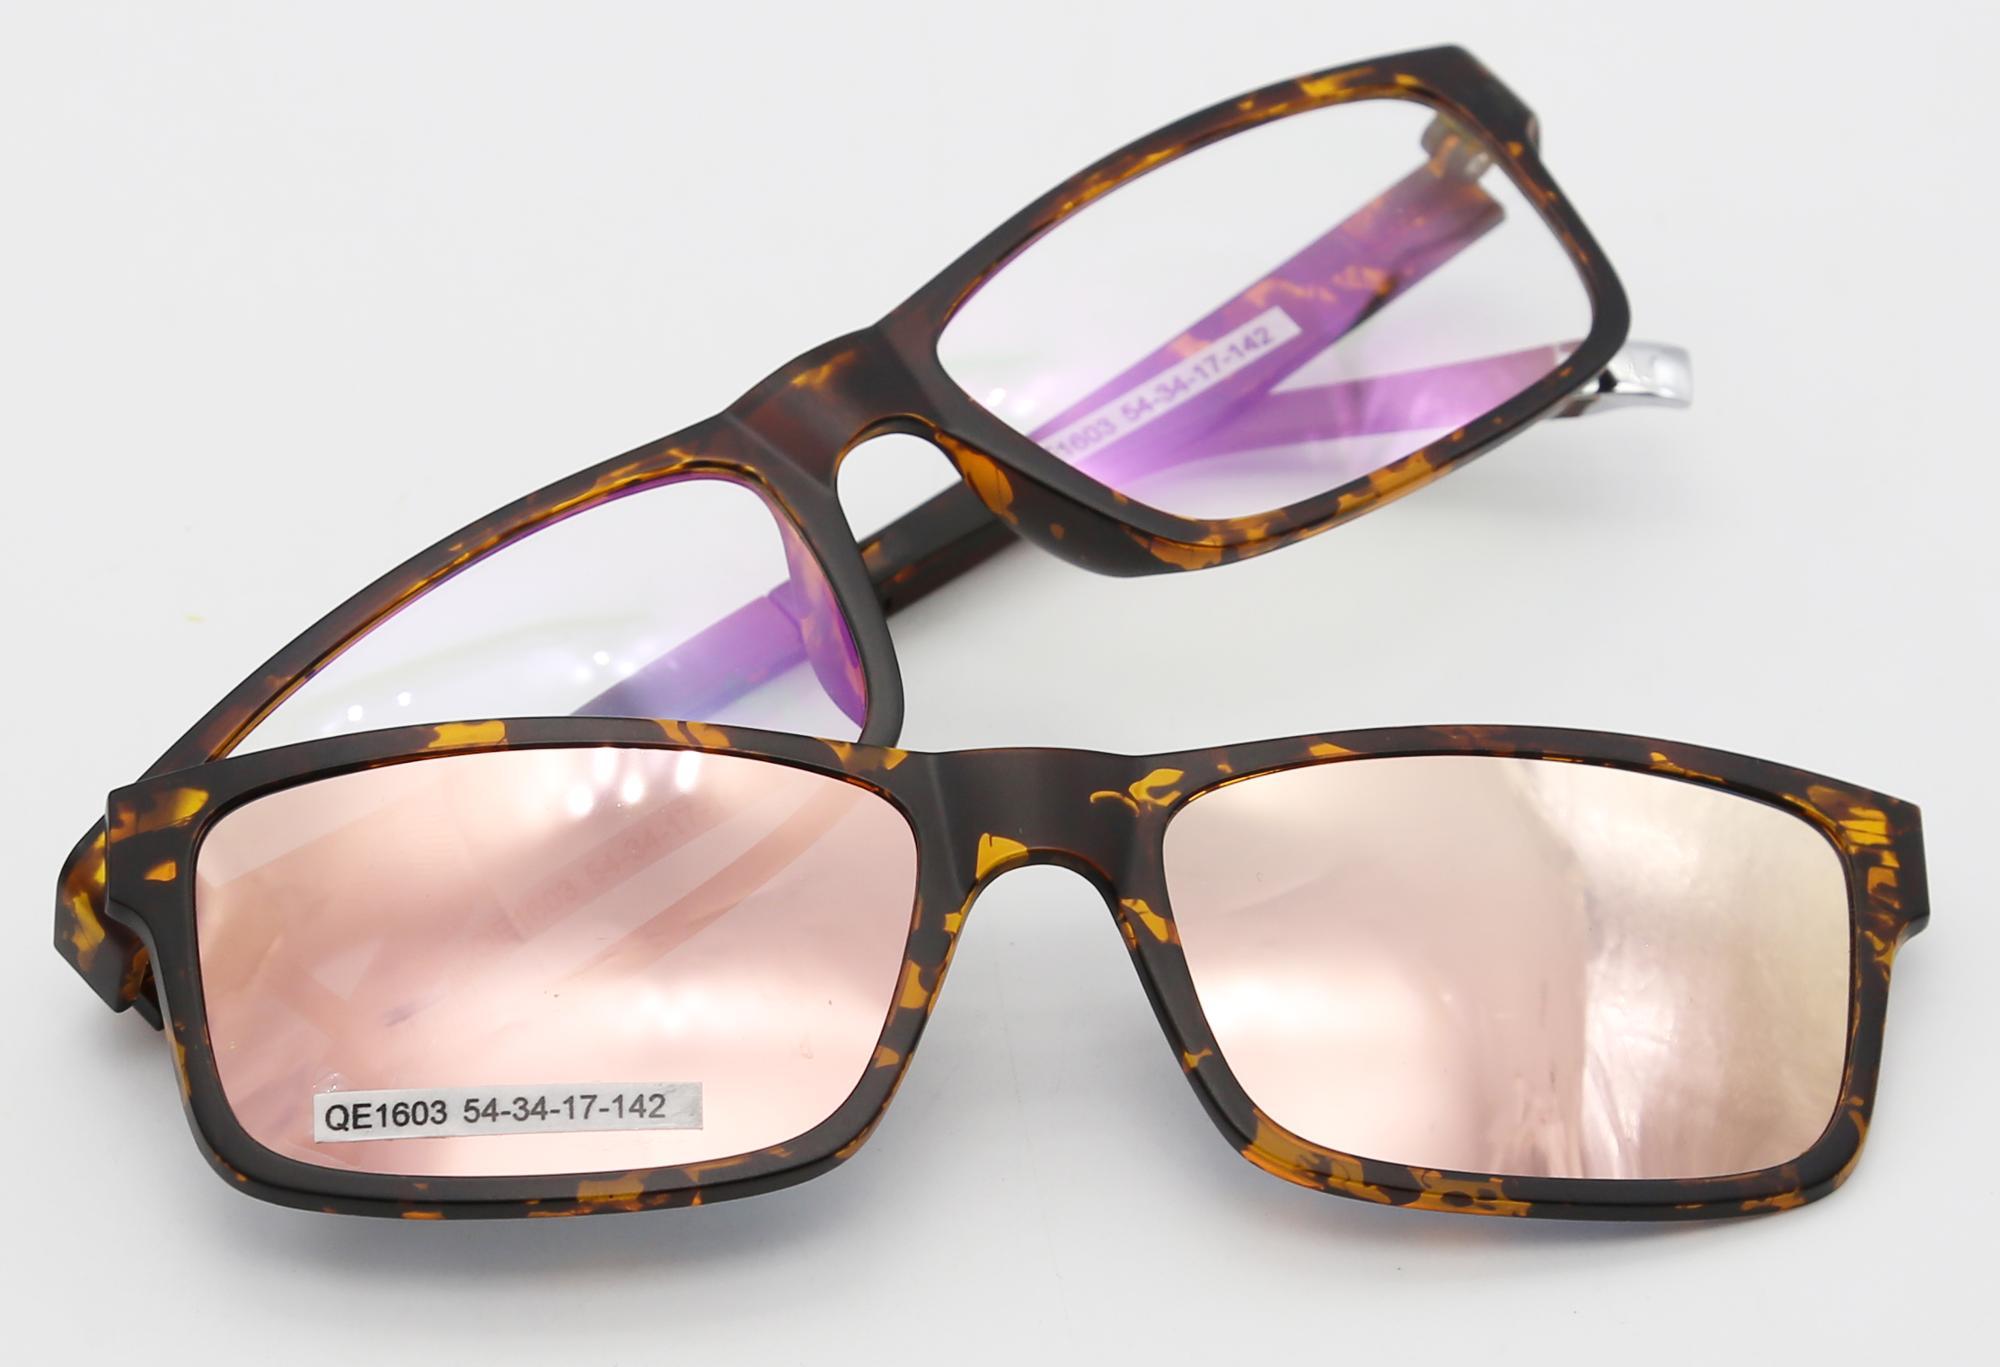 38f9548927 Best Seller UV400 Fashion Polarized Sunglass Magnetic Clip On Sunglasses